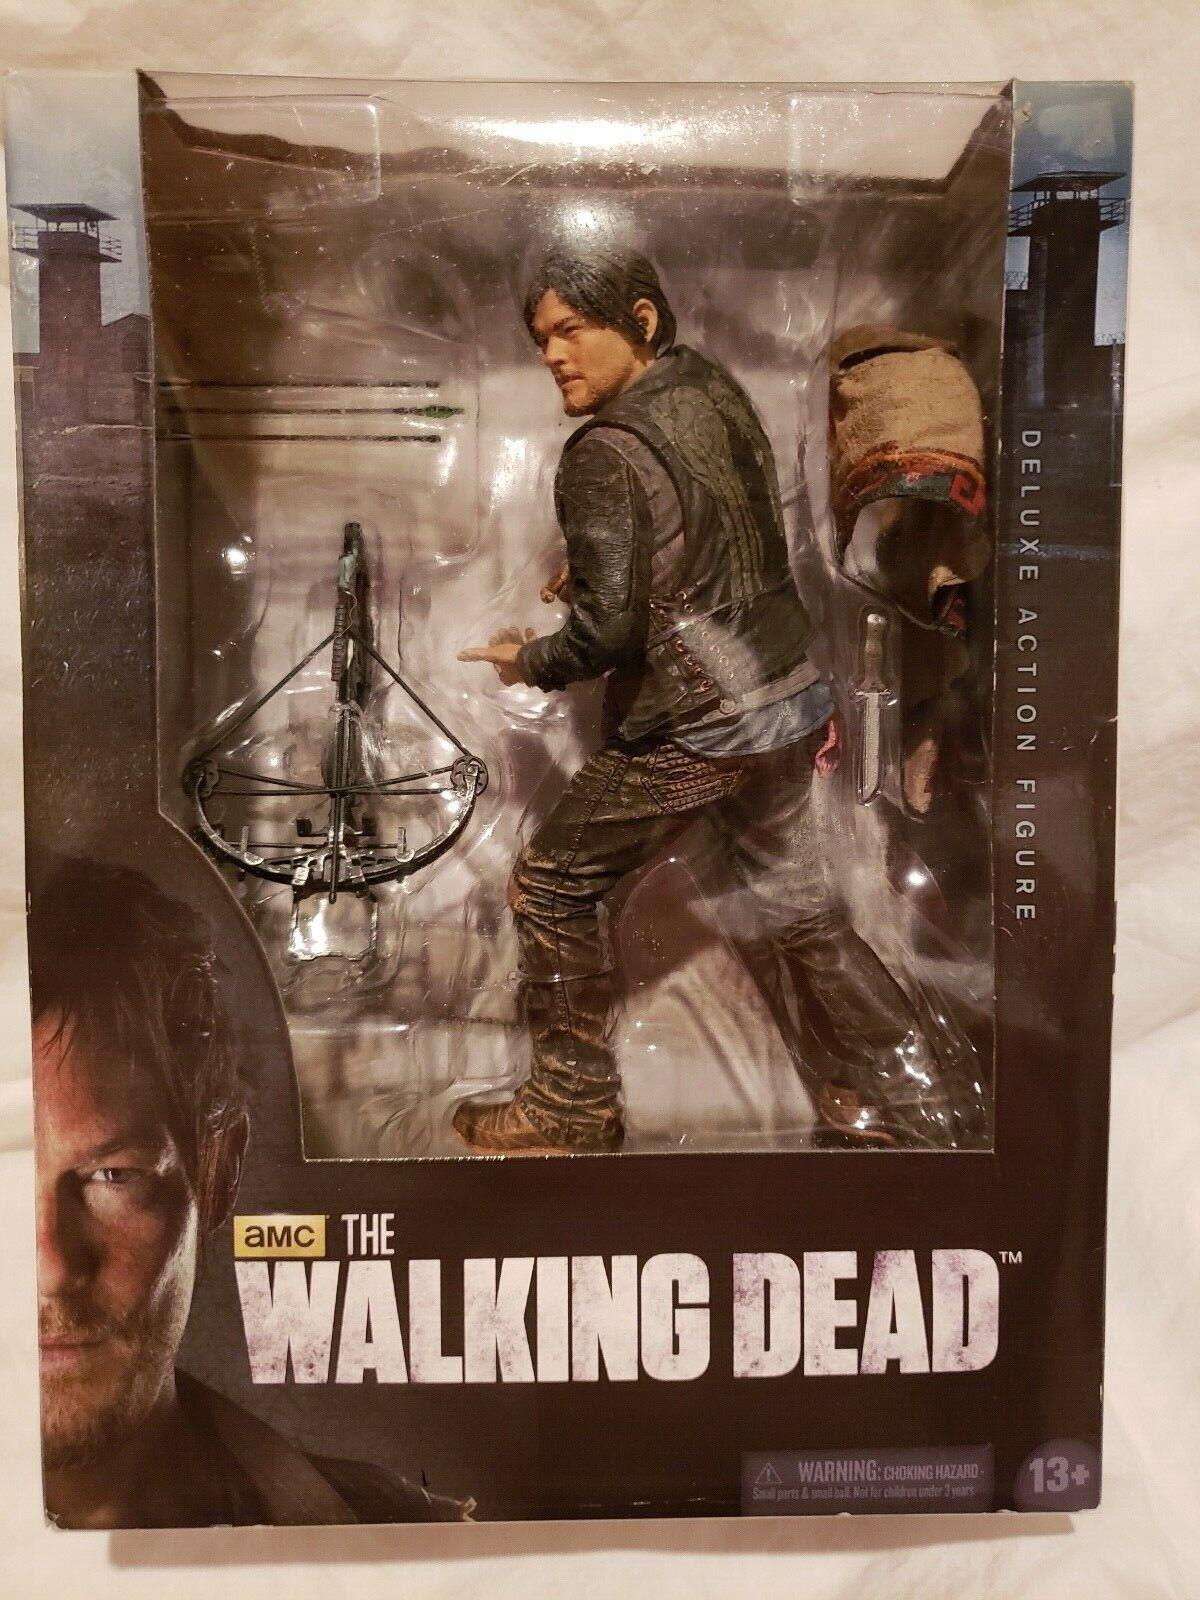 AMC TV  THE THE THE WALKING DEAD McFARLANE TOYS DARYL DIXON 10  FIGURE...NEW IN BOX  92e568